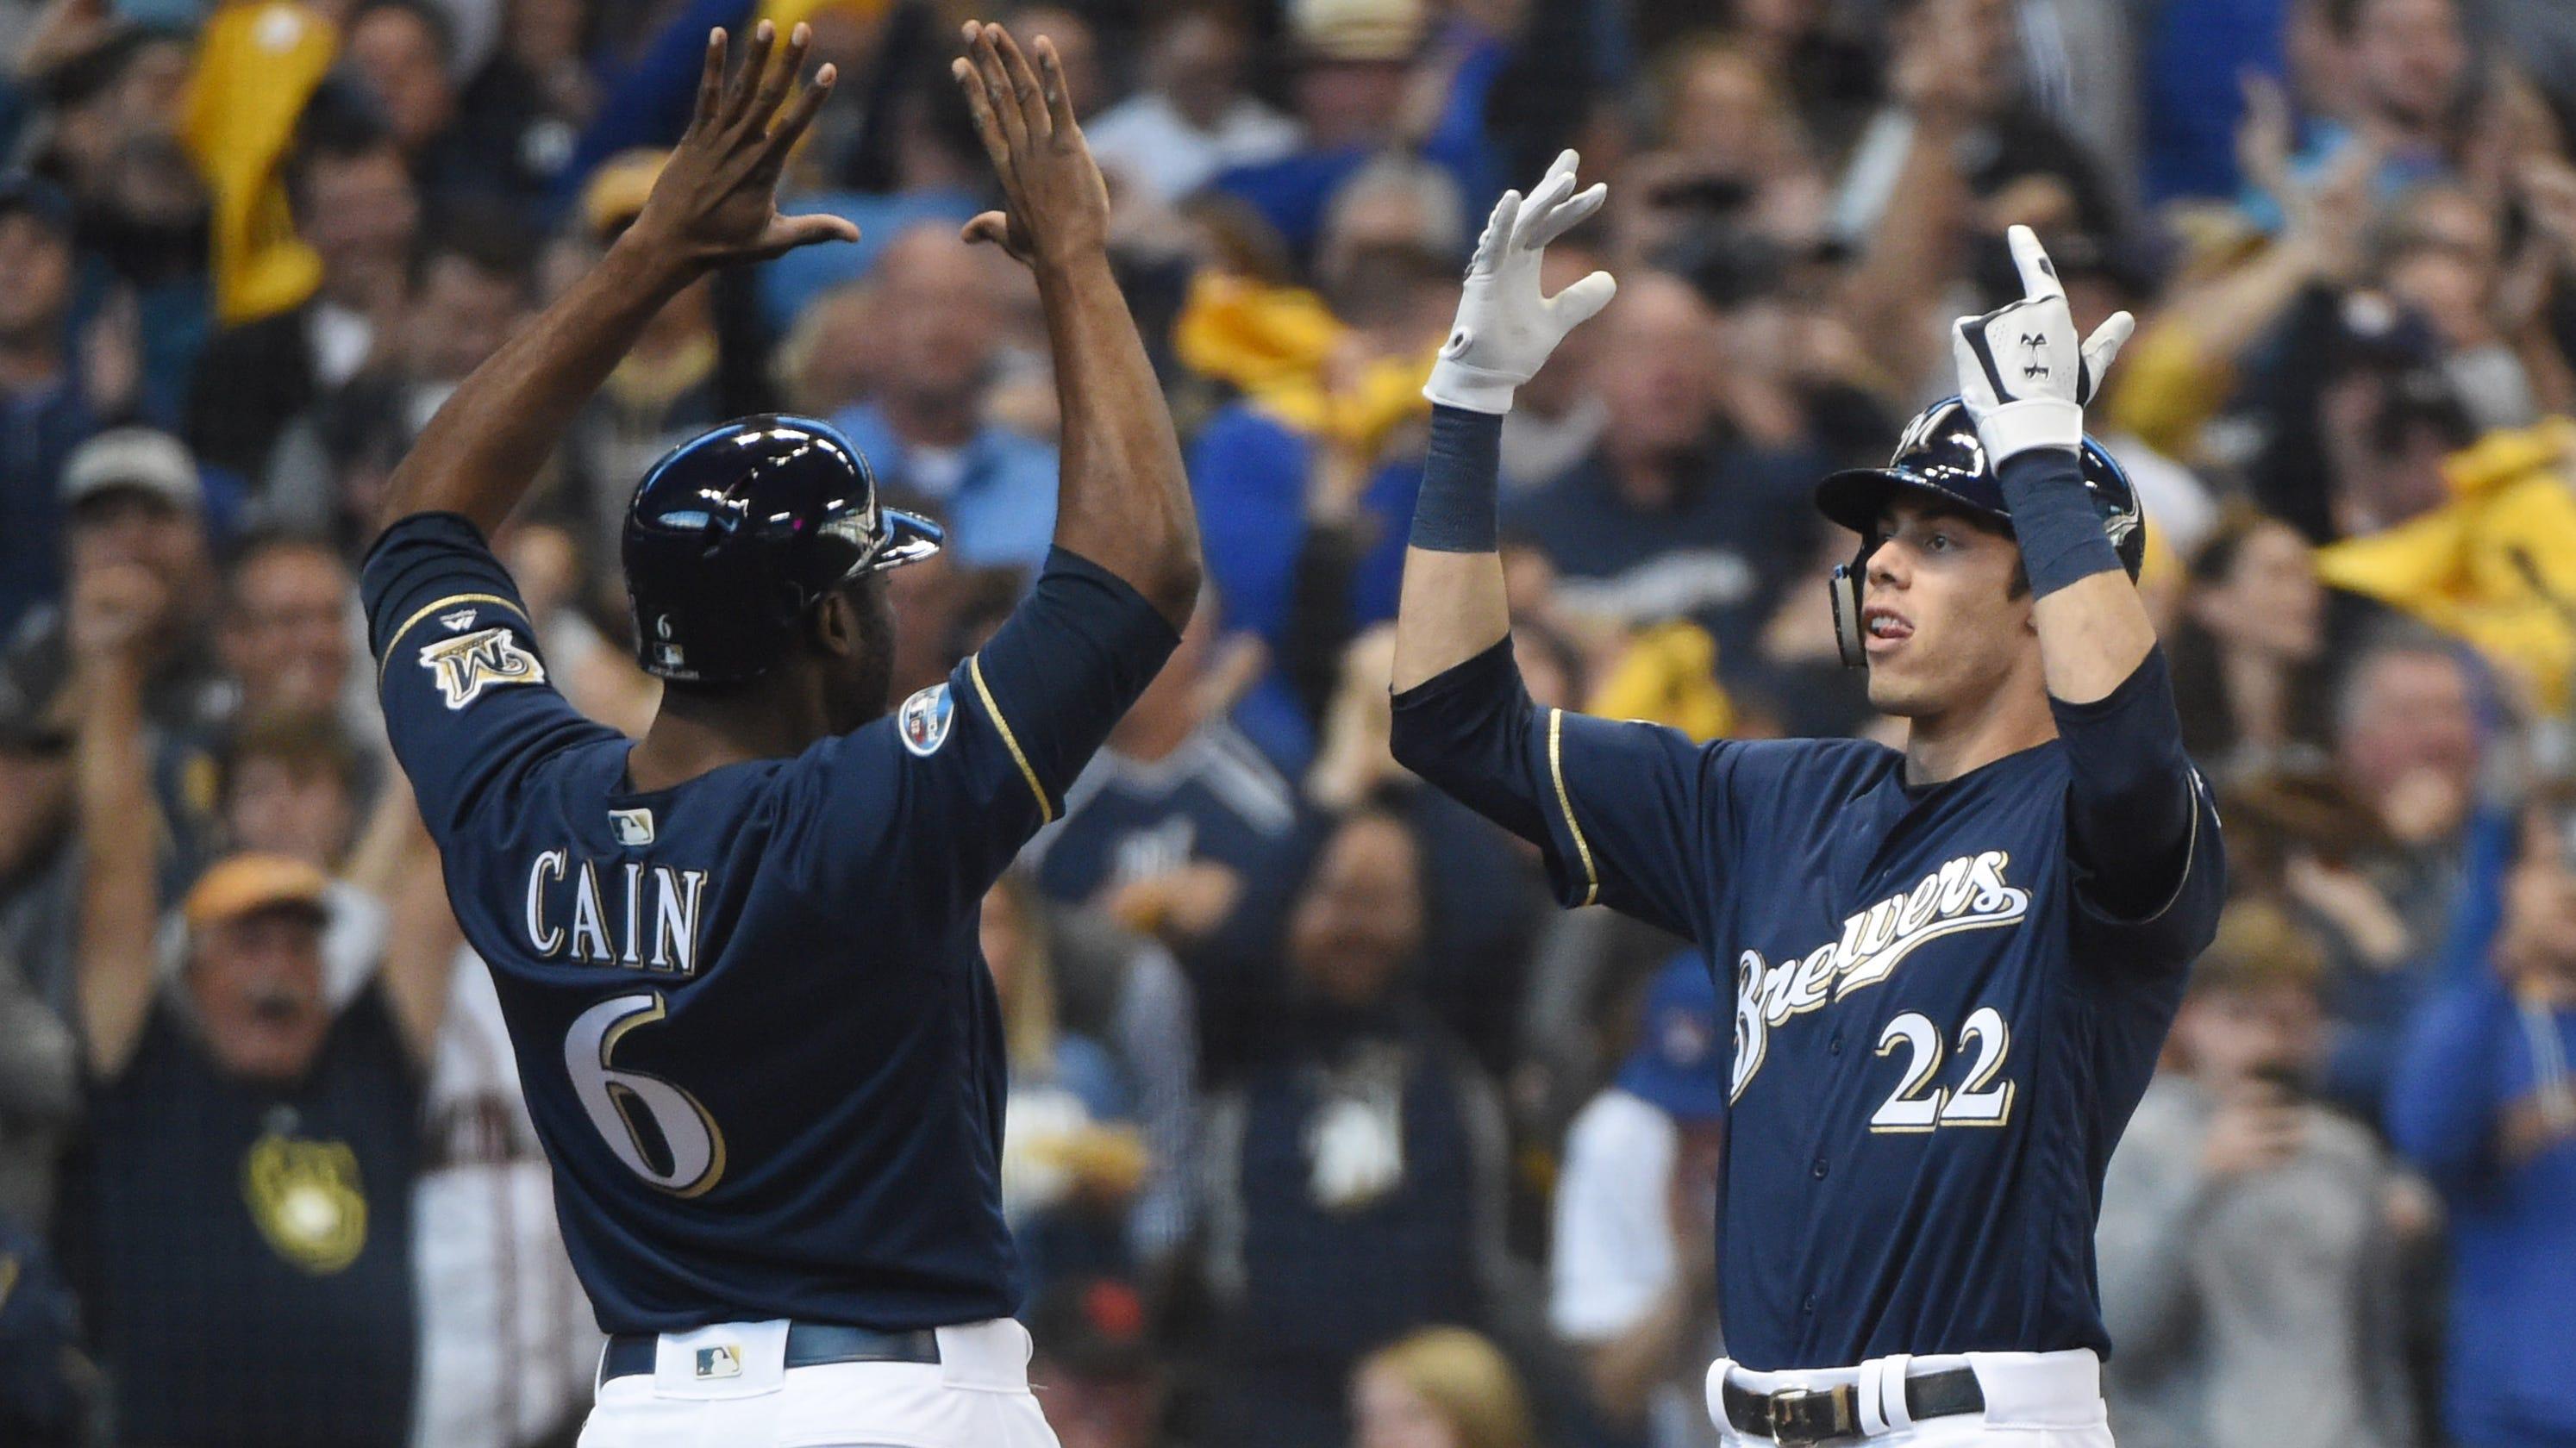 MLB playoffs: Trading Christian Yelich a move Derek Jeter